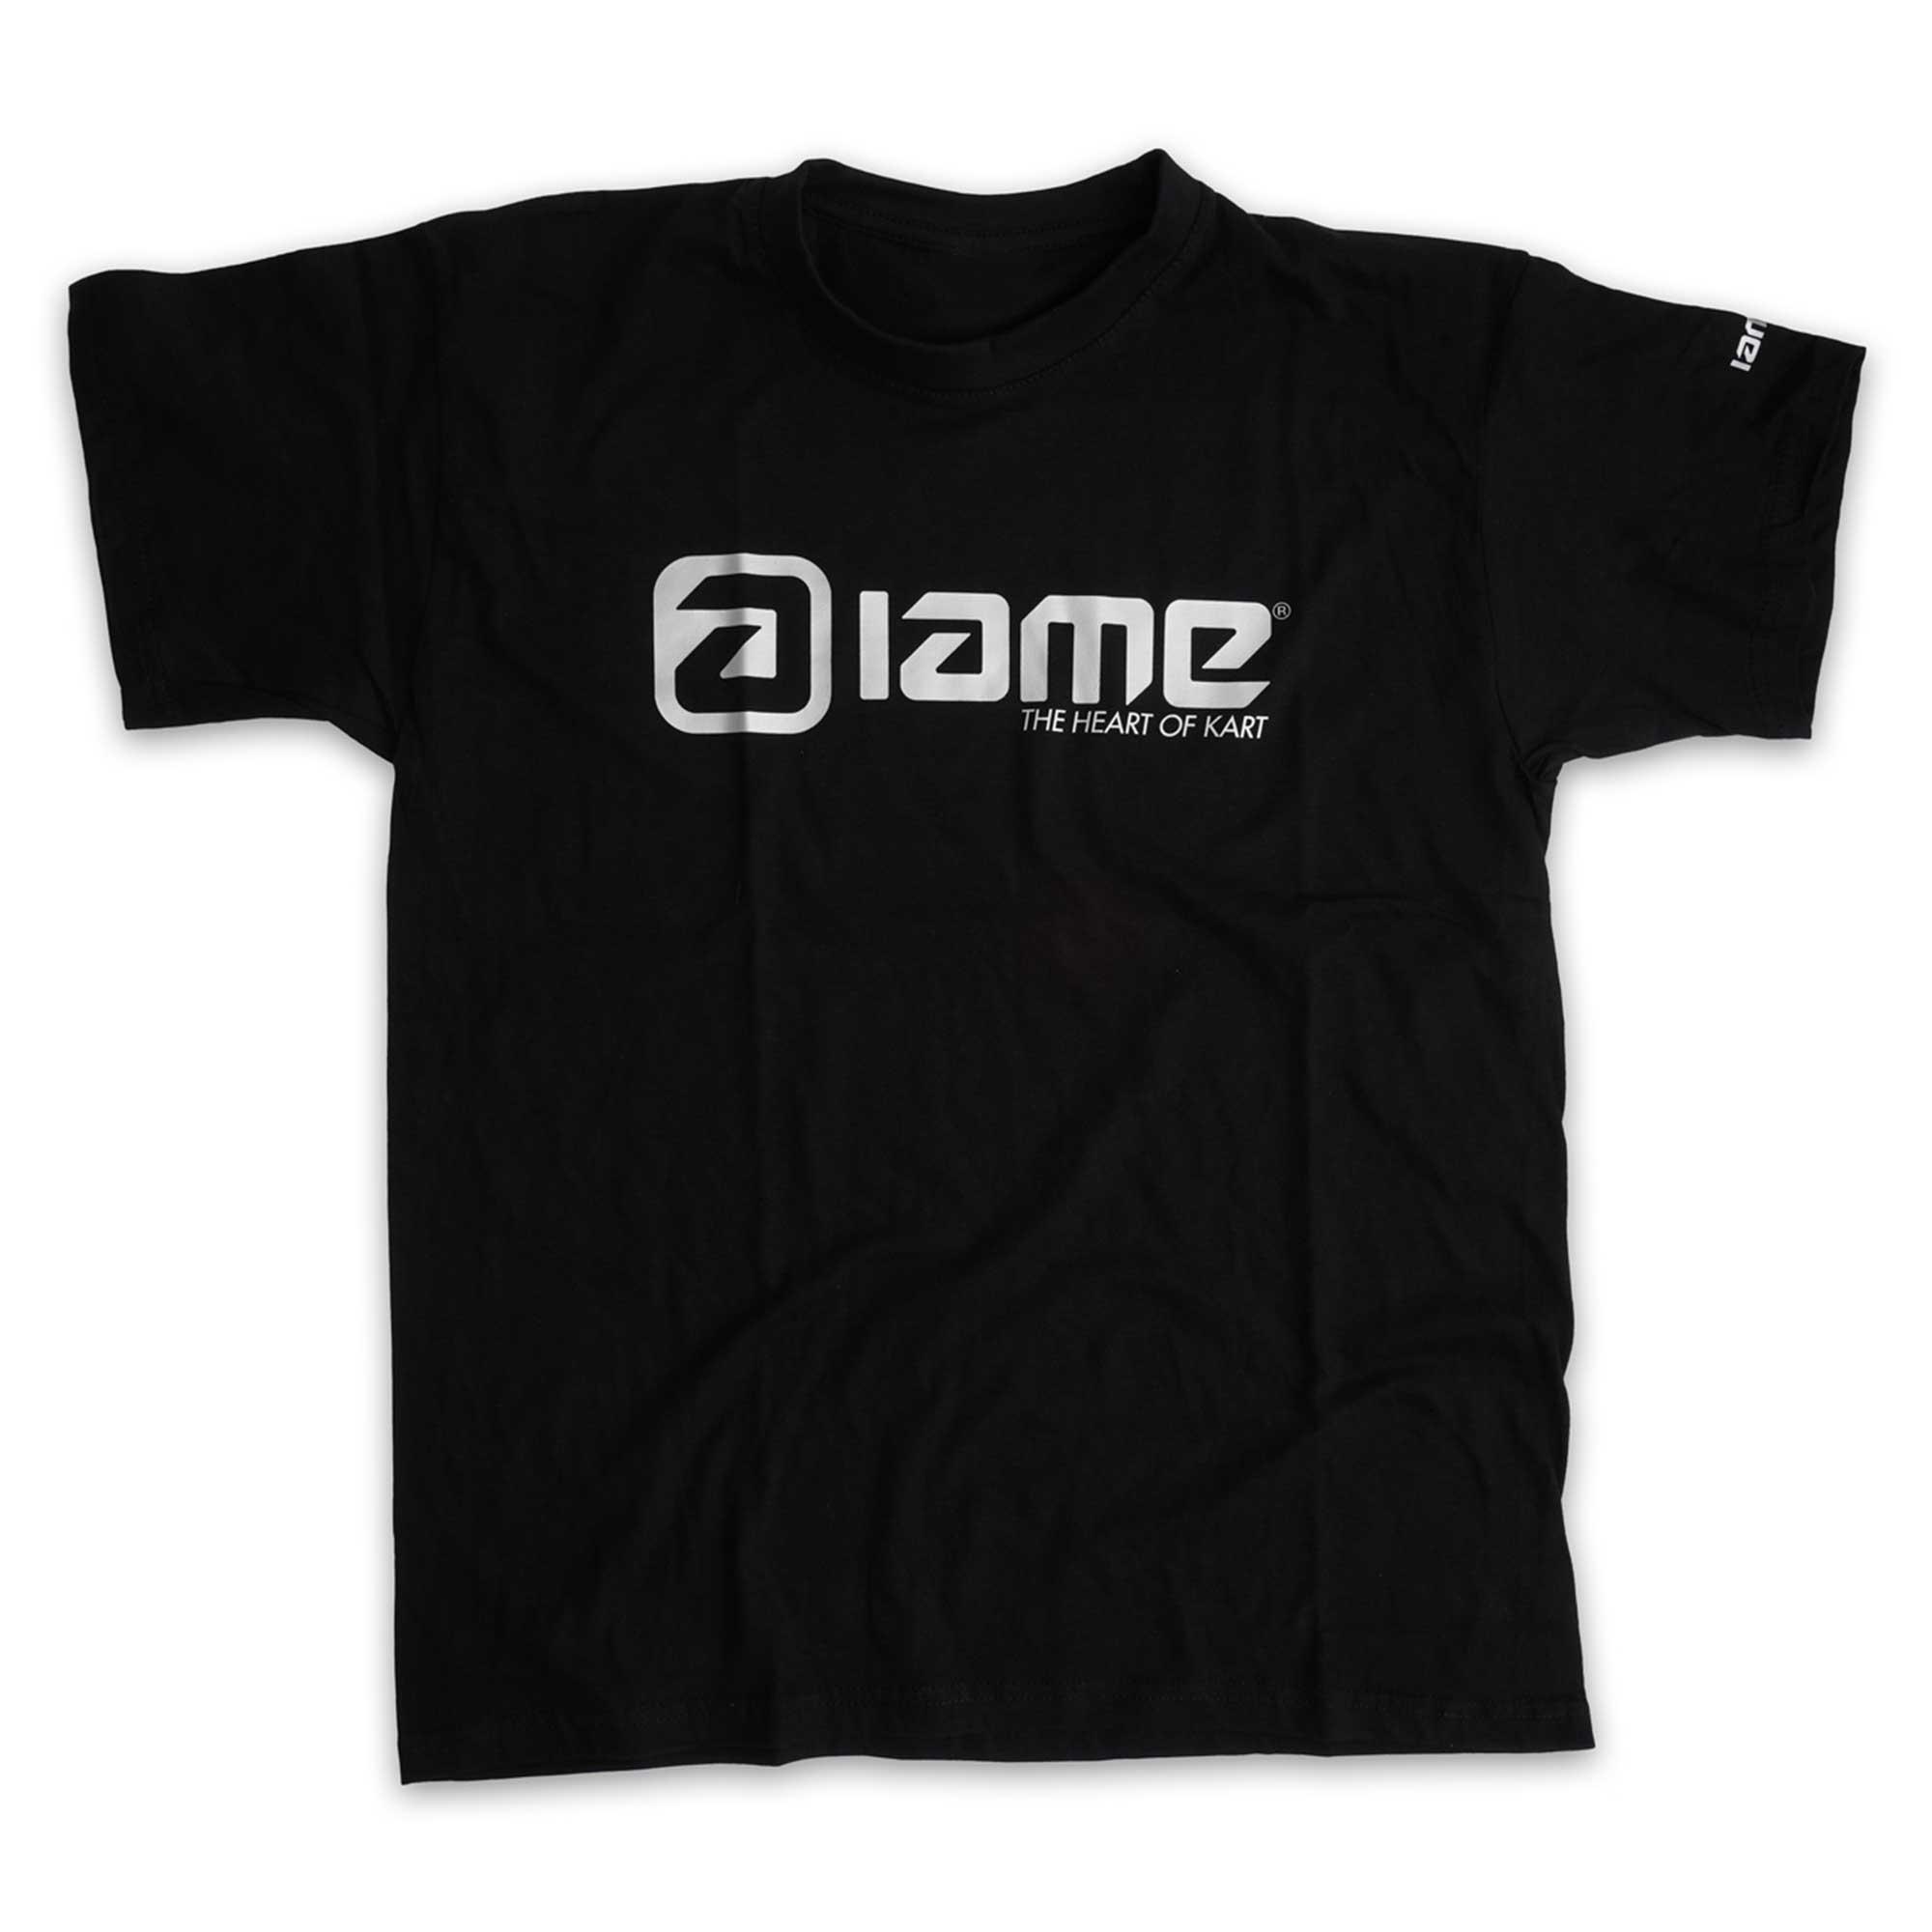 unlead-advertising-iame-the-heart-of-kart-merchandising-1